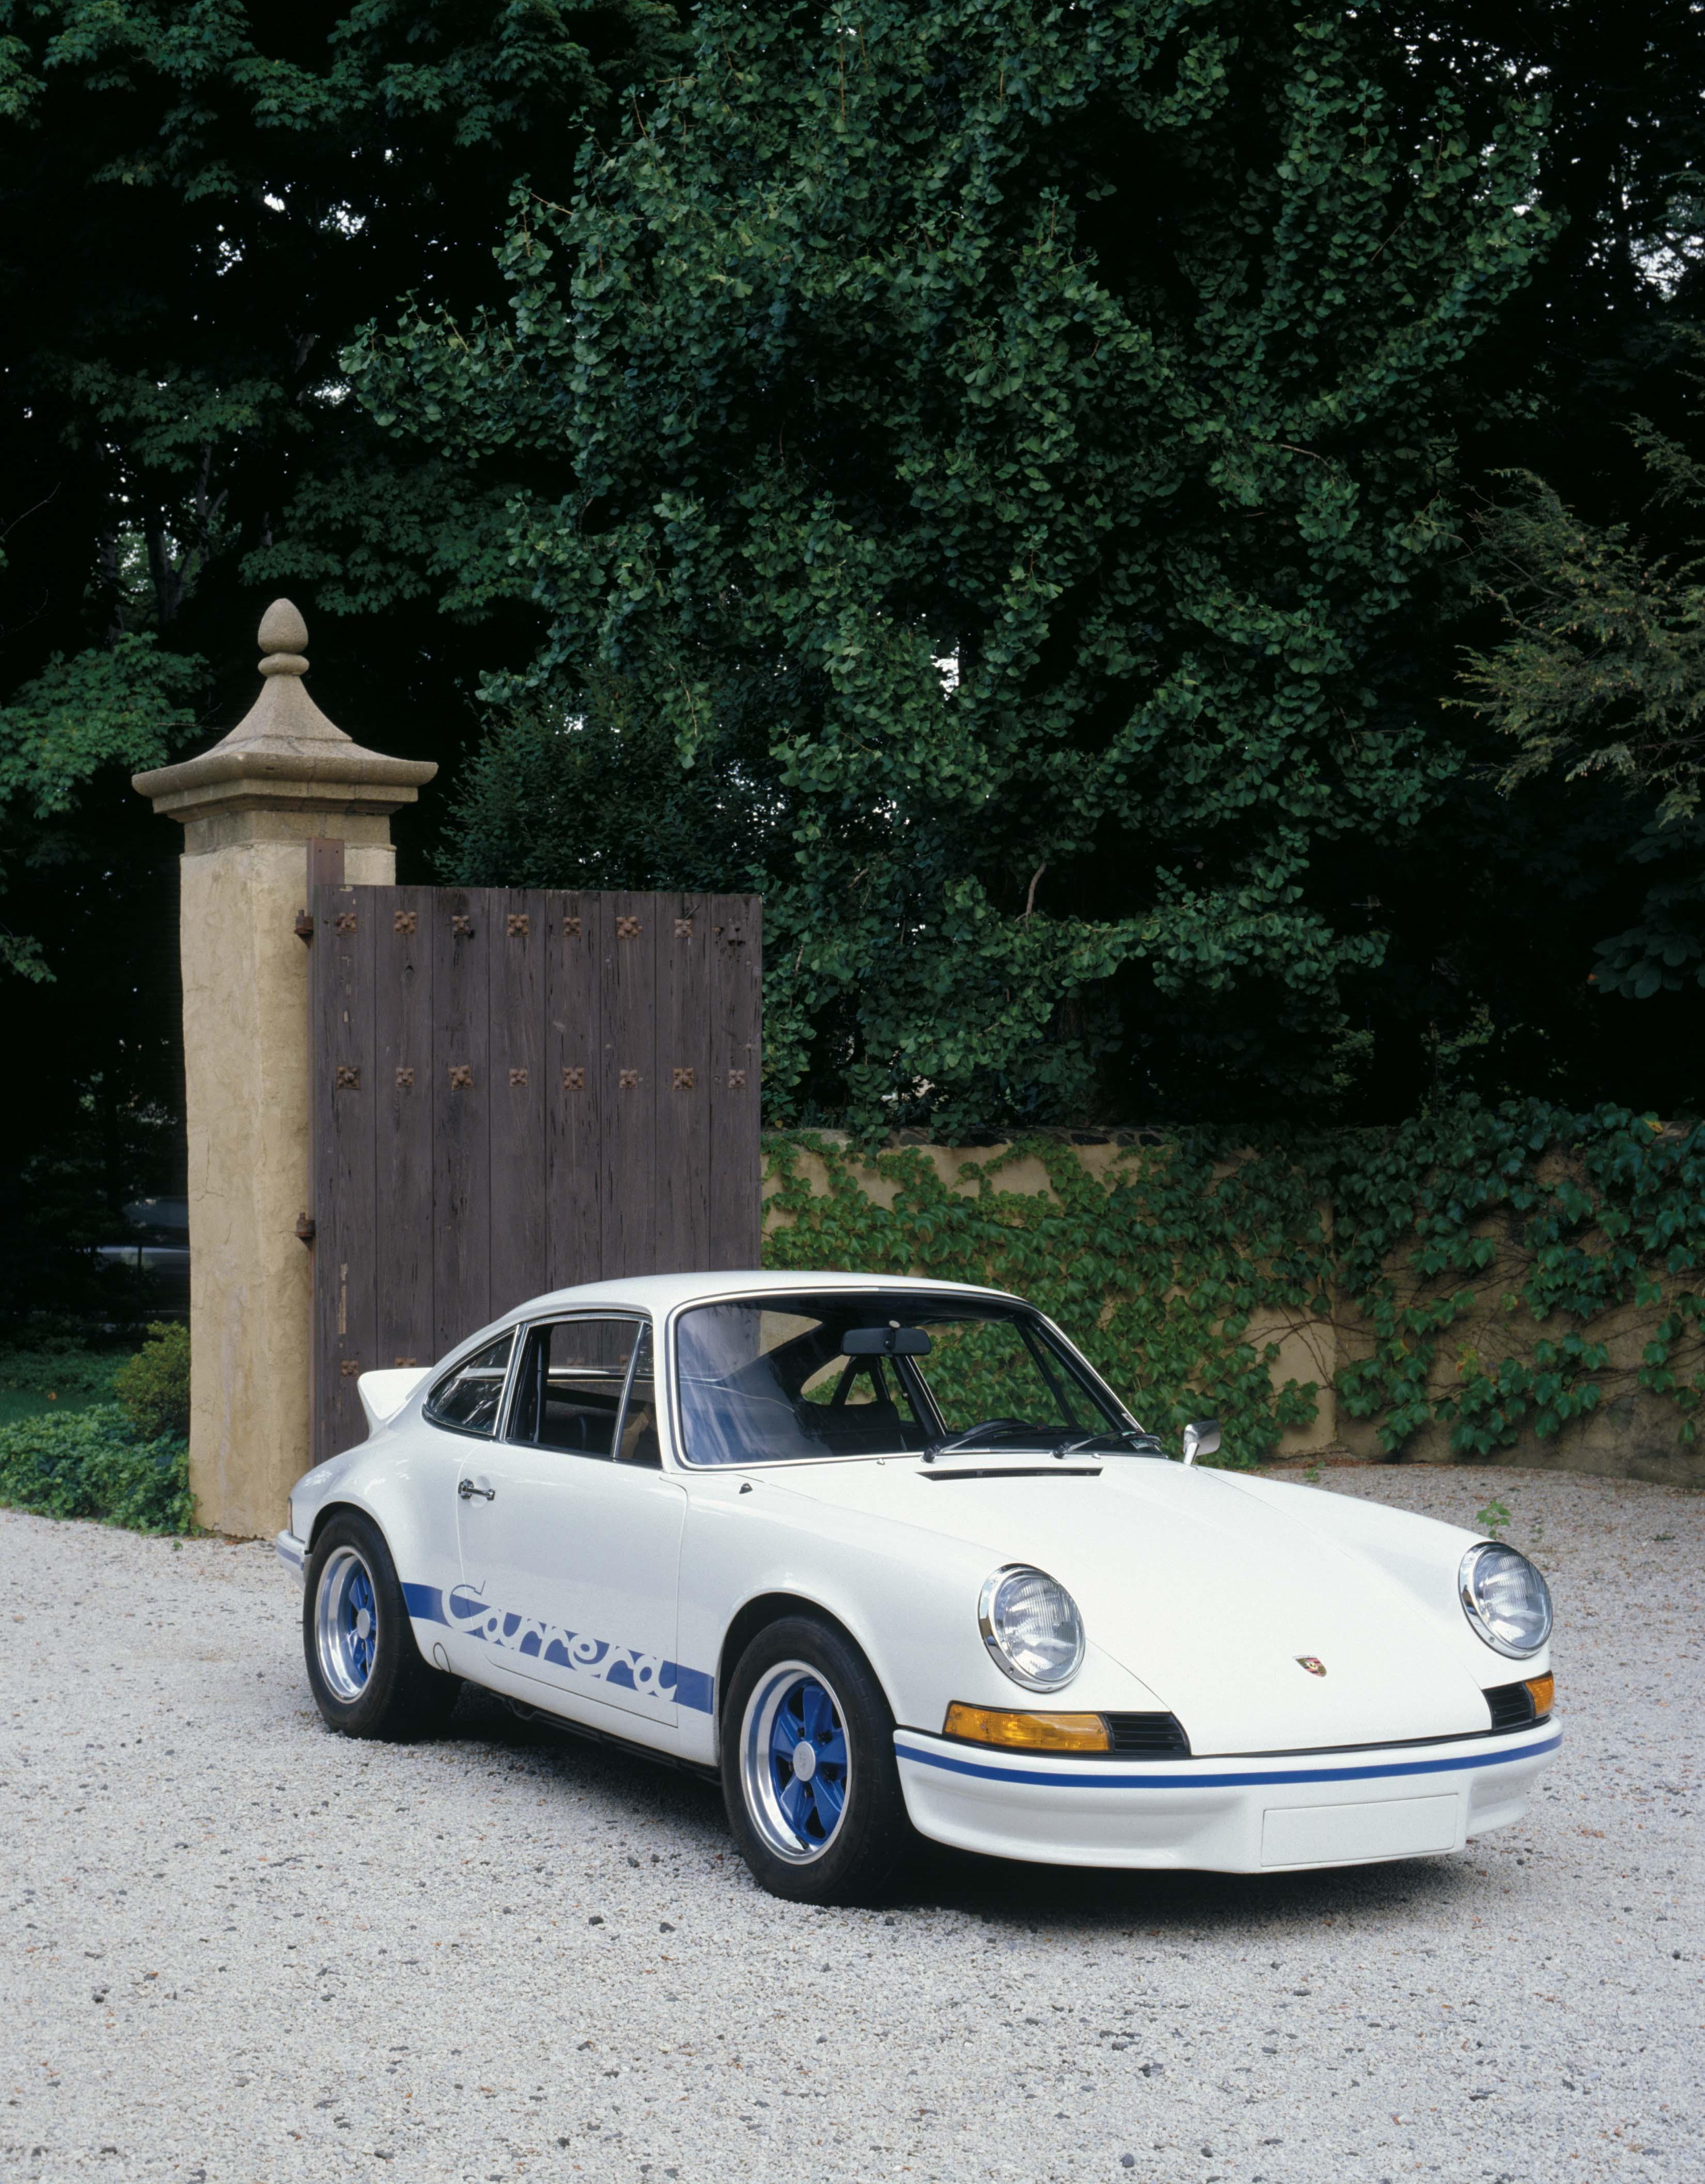 1973 Porsche Carrera Rs 2 7 The Ultimate Classic 911 Heacock Classic Insurance